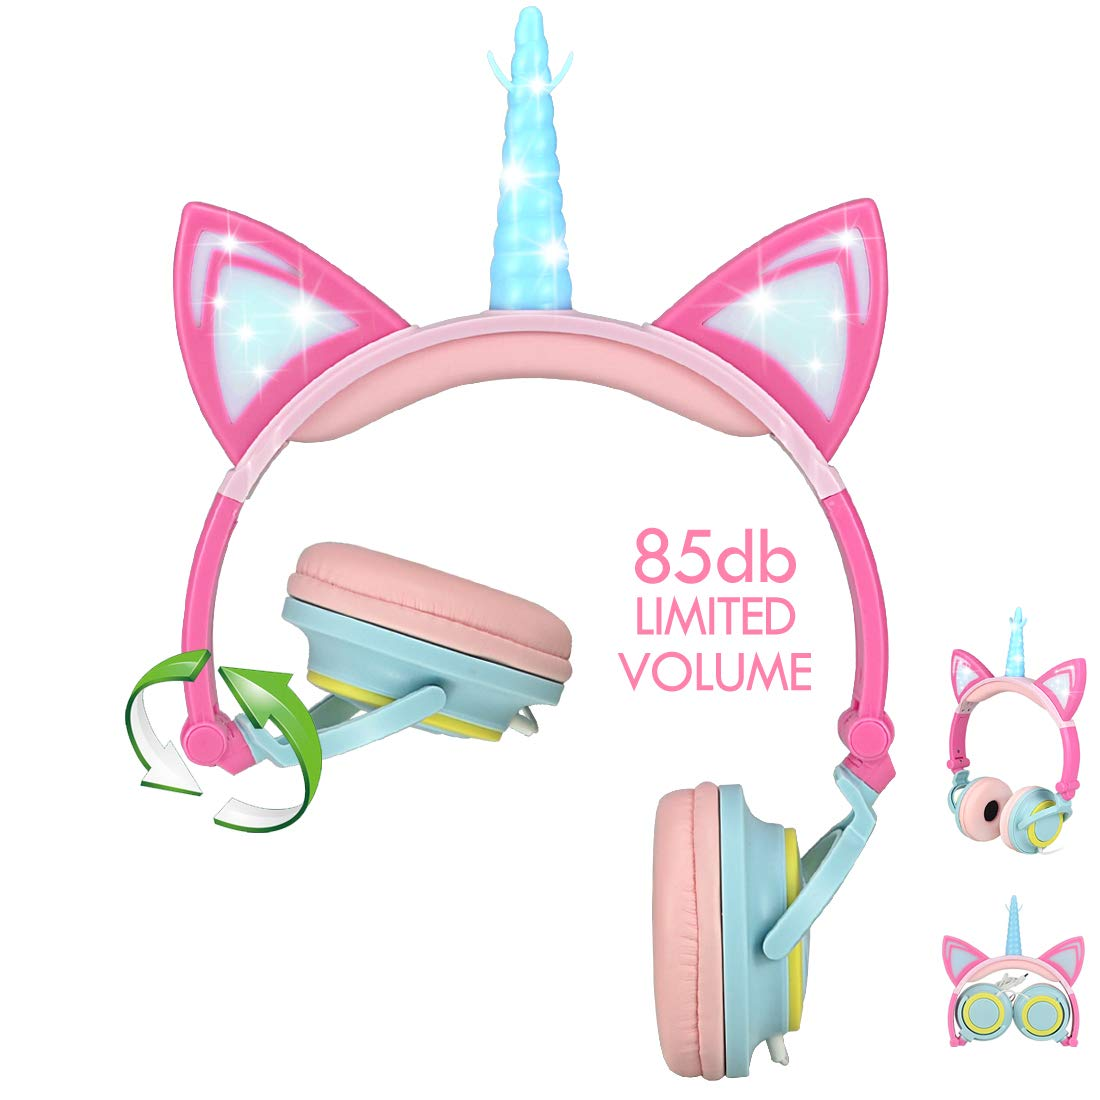 Nice2Mitu Cat Ear Kids Headphones for Girls Tablet School Supplies, Led Glowing Headphones for Kids, Foldable Over On Ear Girl Headphones Toddlers Travel Birthday Gifts (Pink)